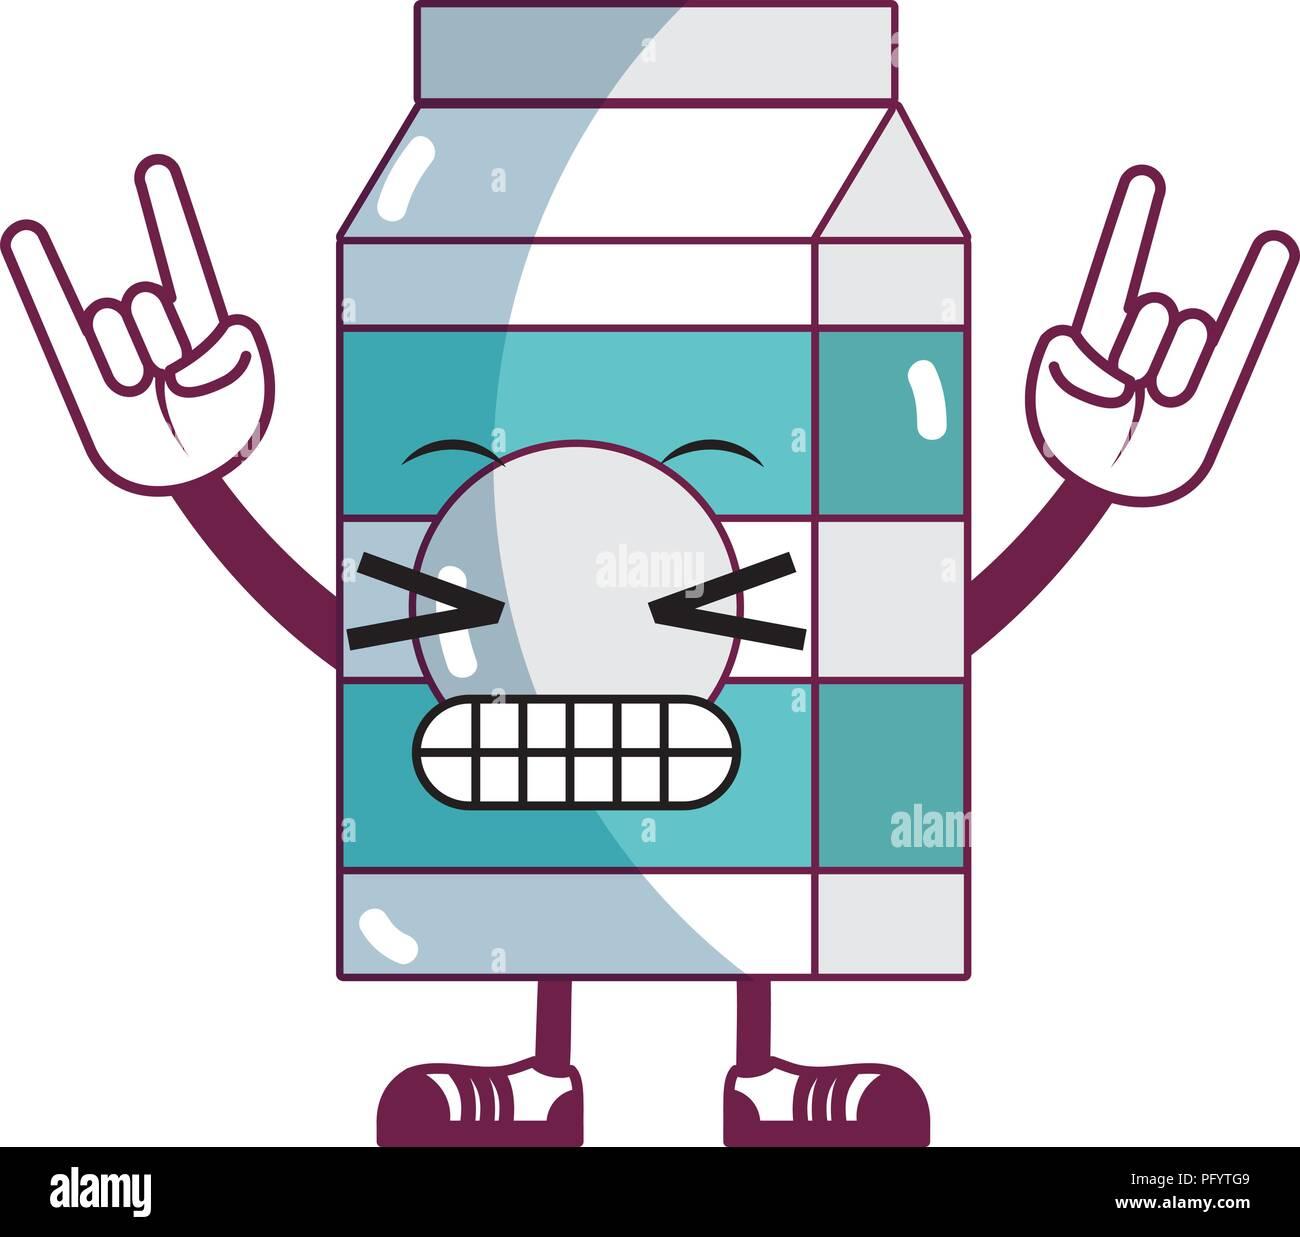 kawaii comical milk box with arms and legs - Stock Image